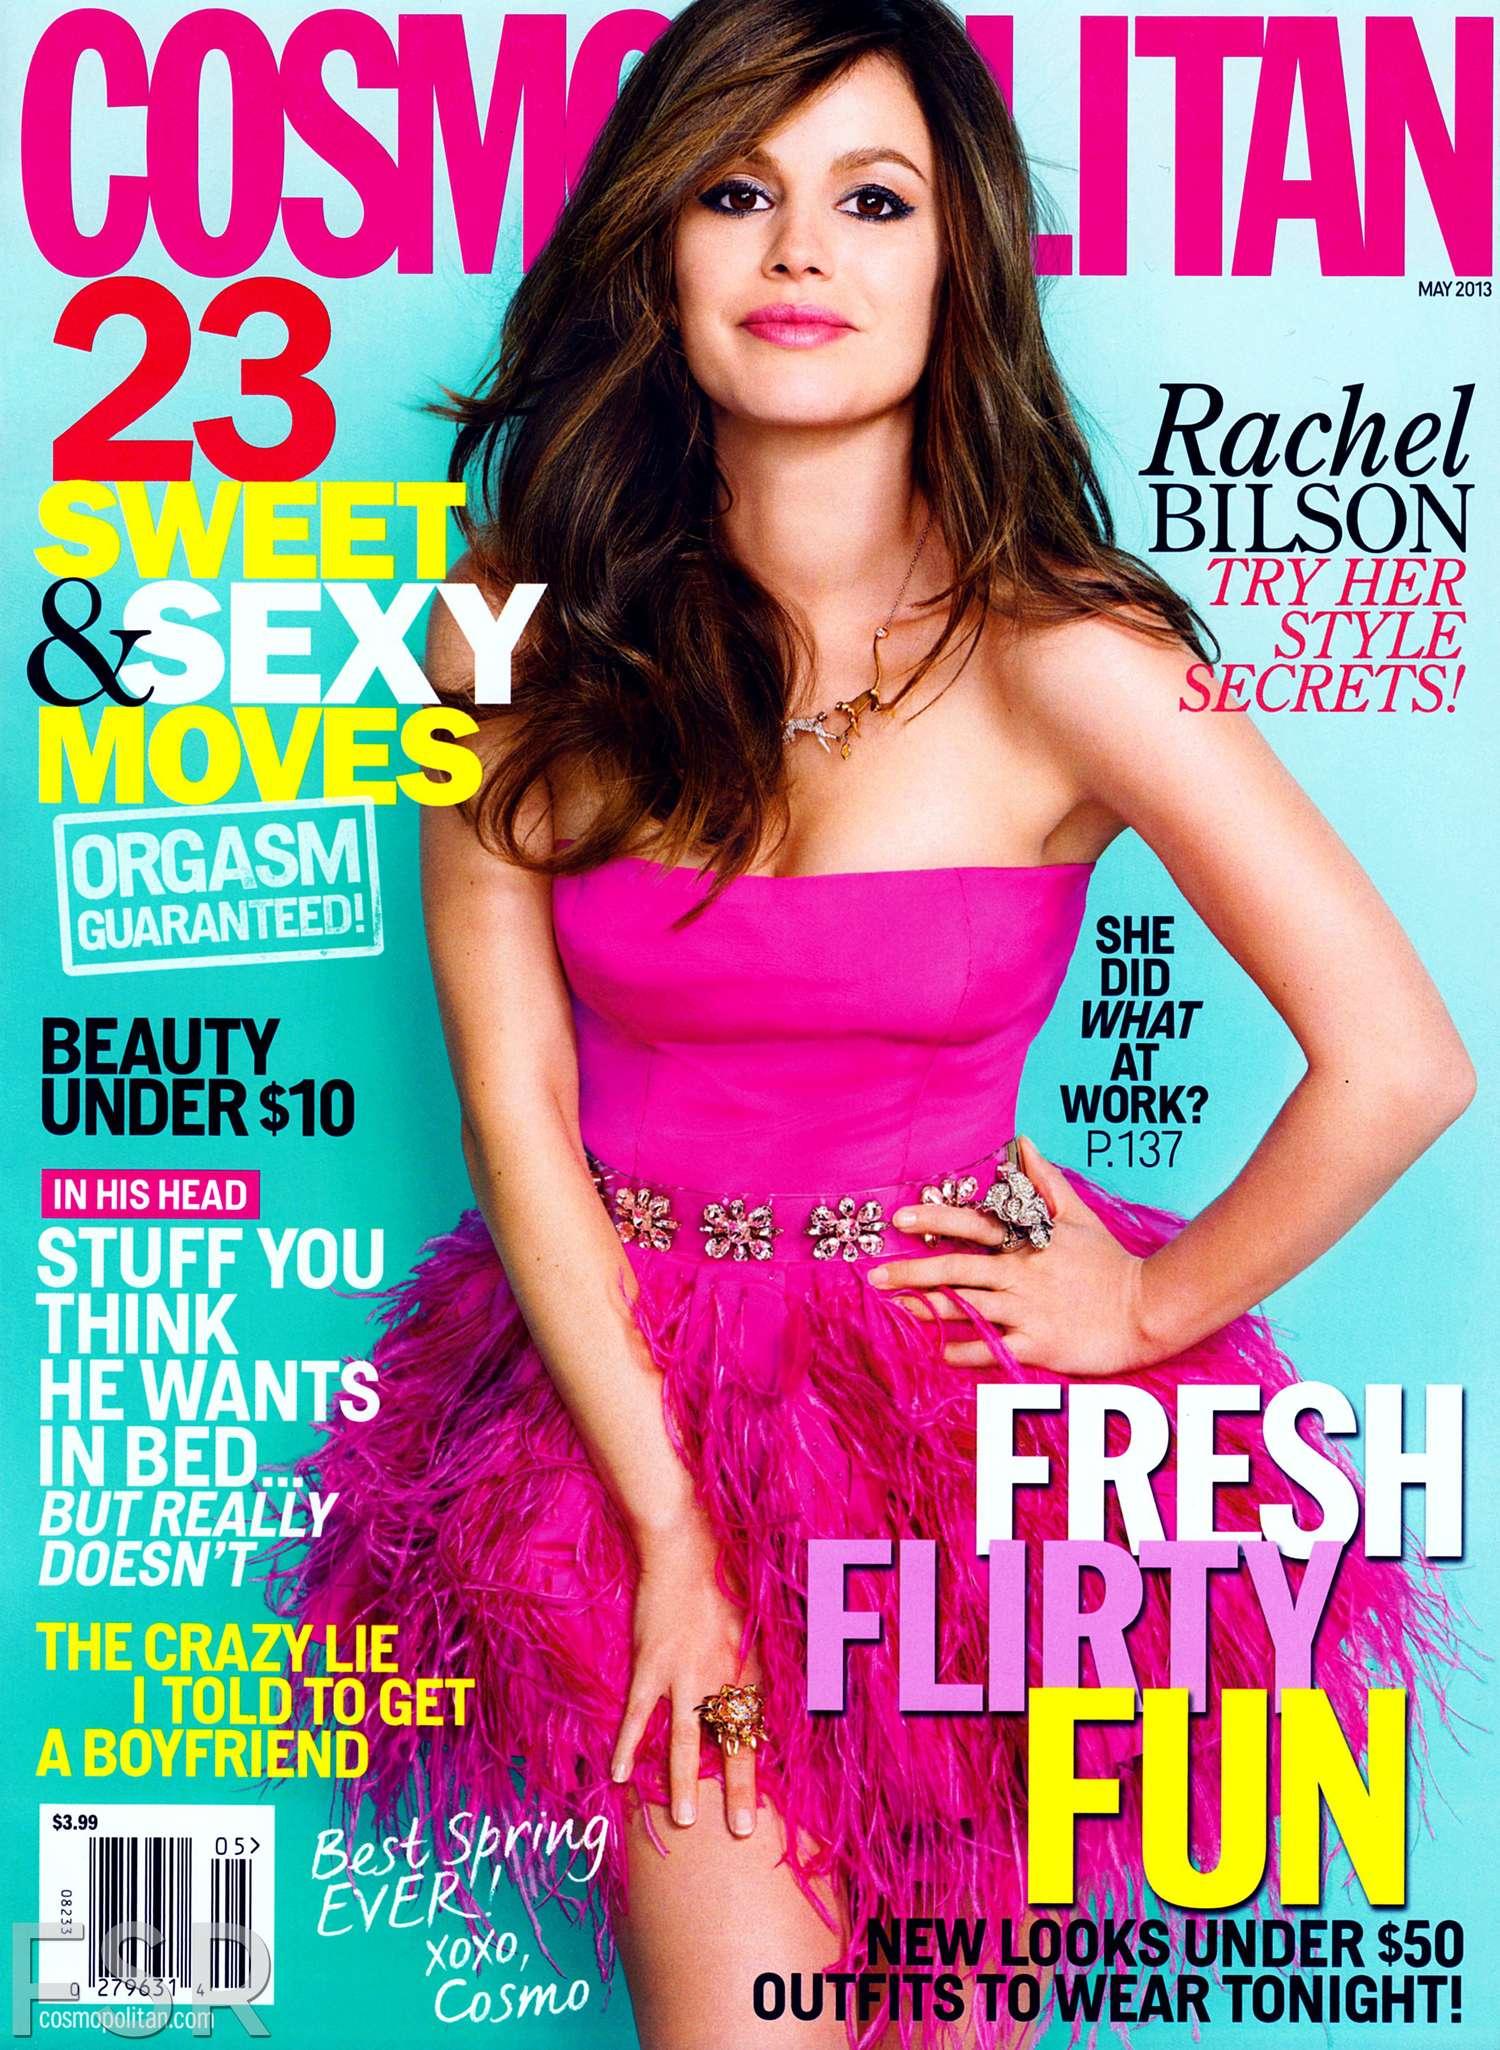 May 2013 Fashion Magazine Covers: Cosmopolitan Magazine (May 2013